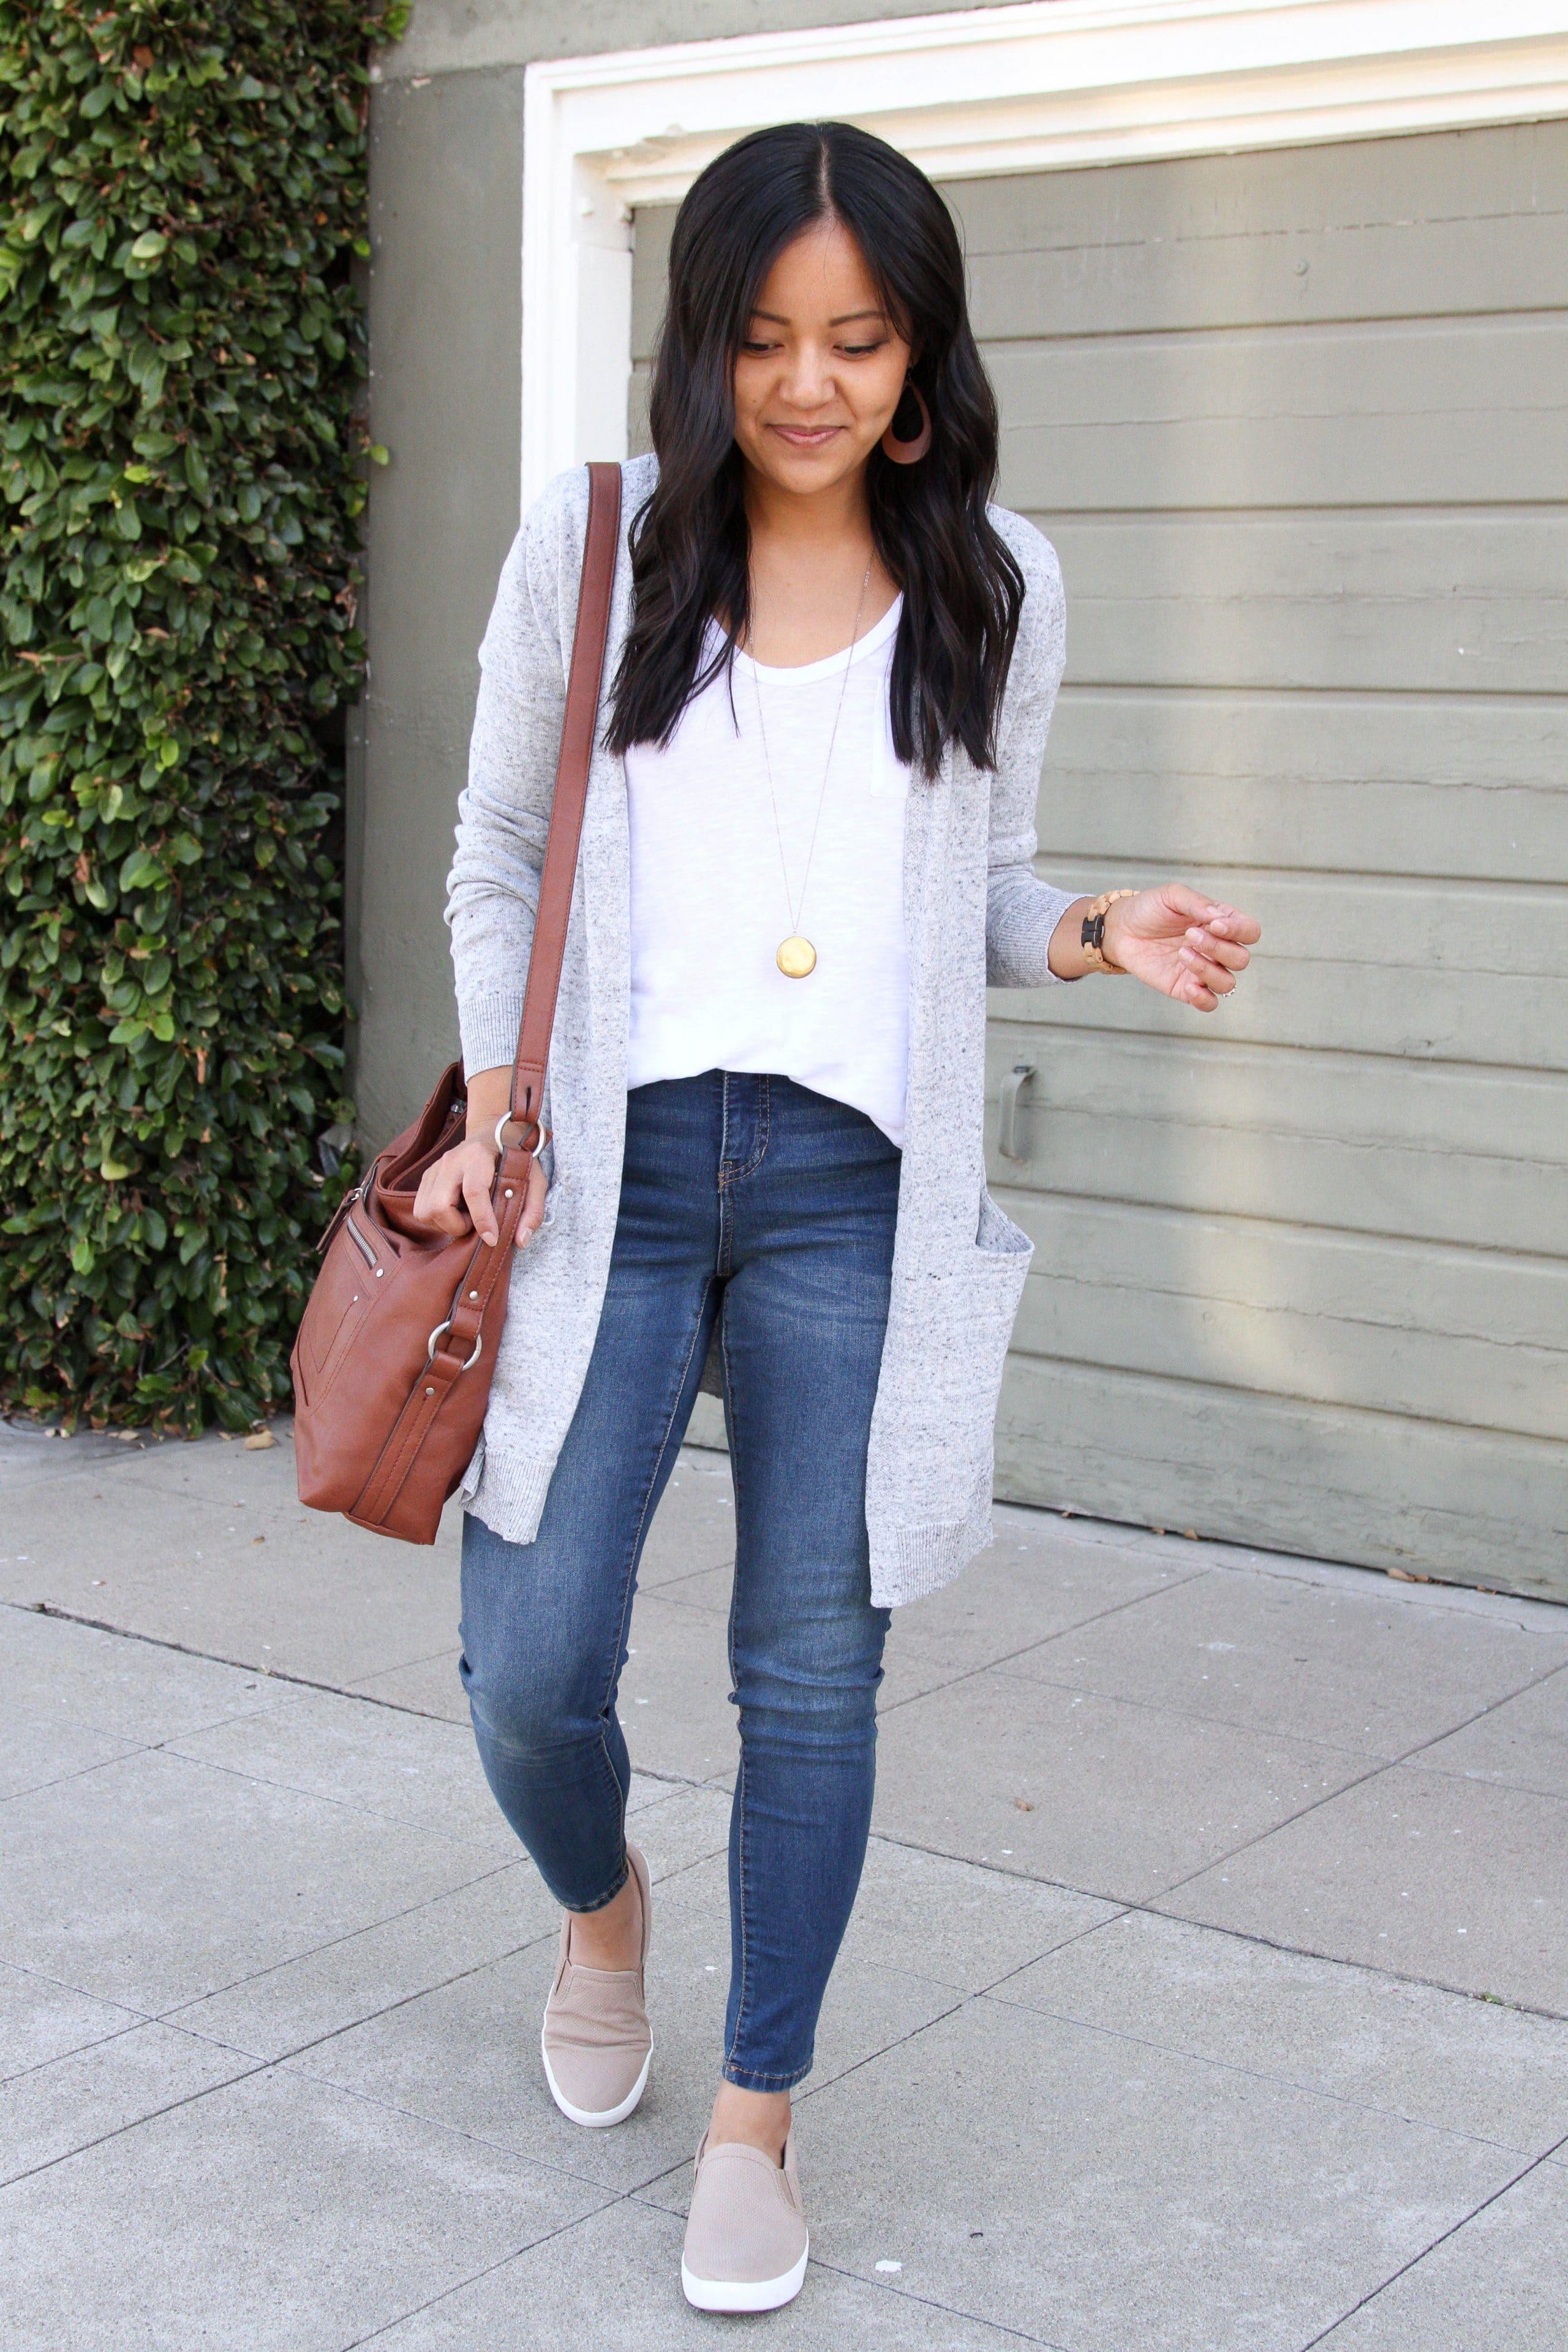 skinny jeans + white tee + grey sweater + tan slip on sneakers + cognac purse